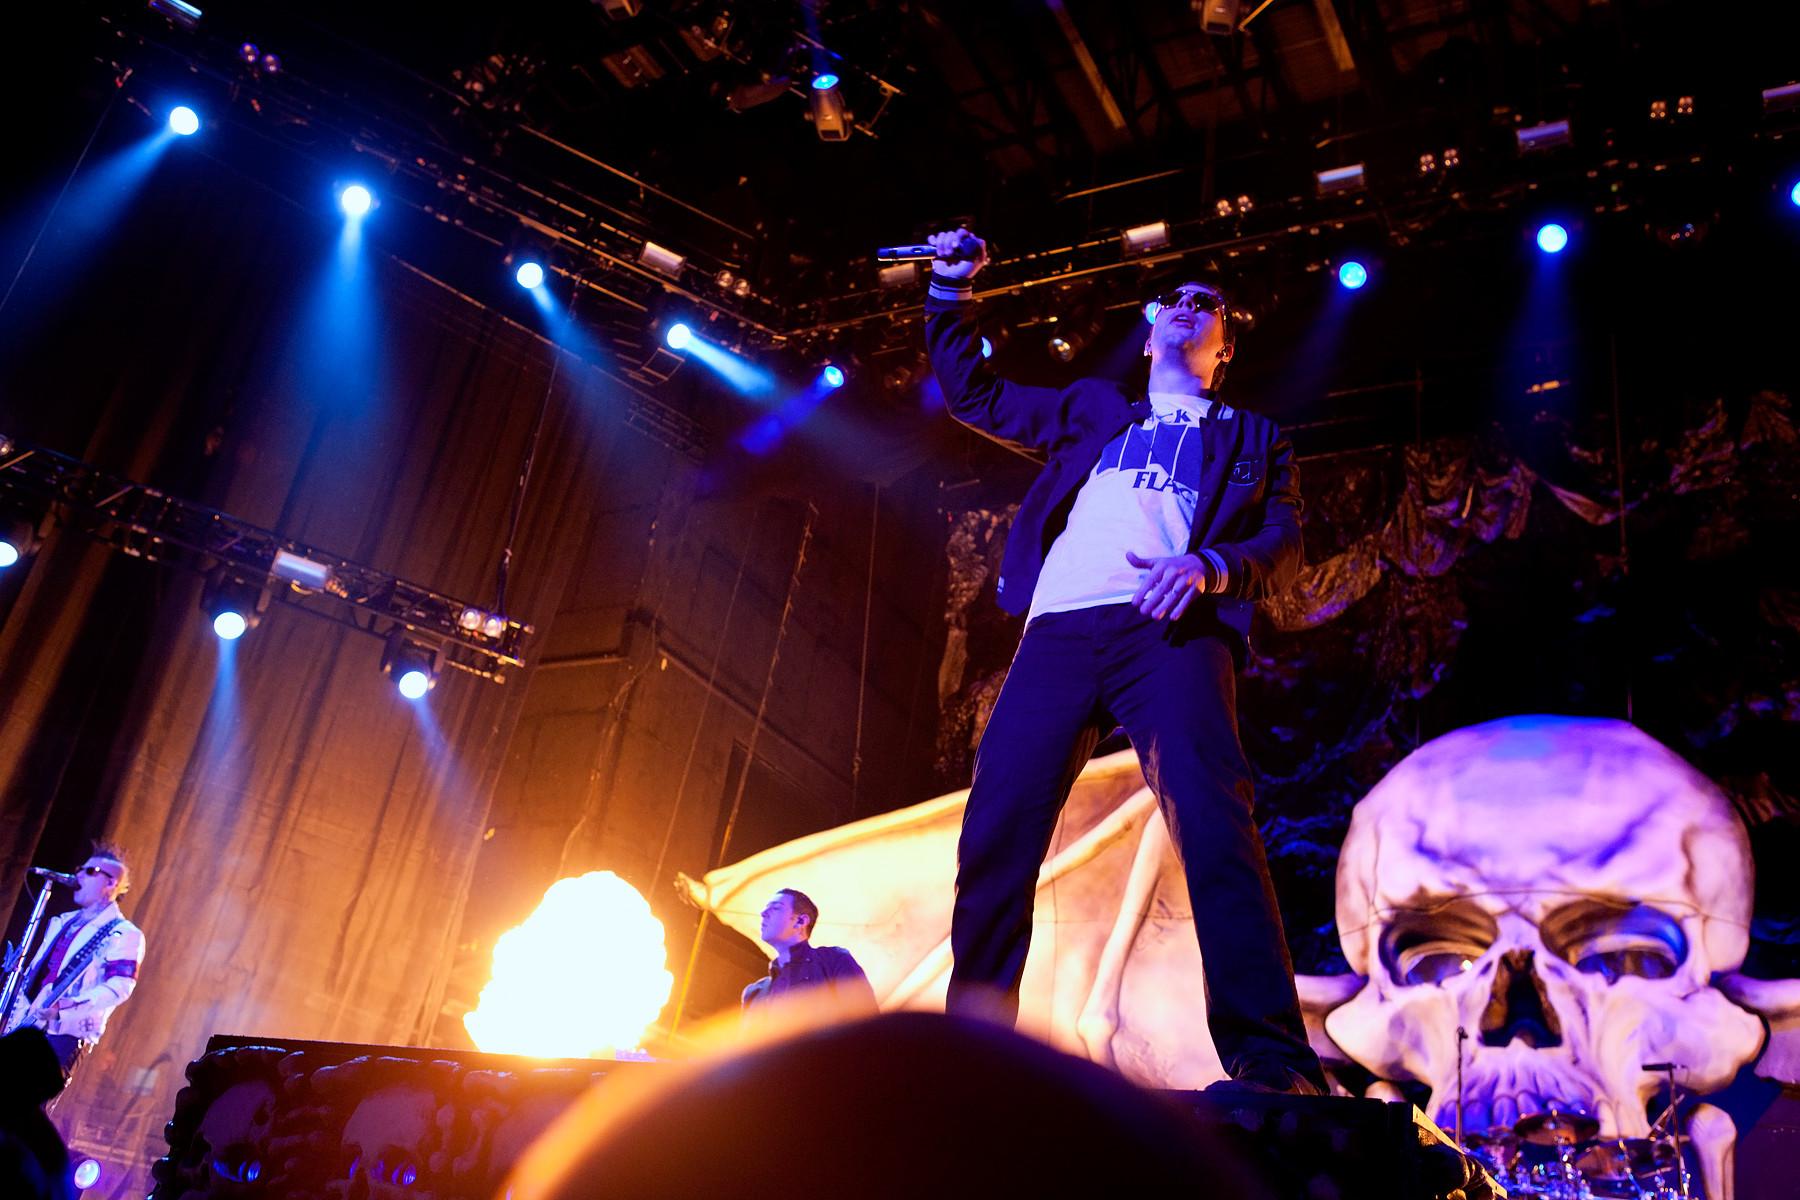 Avenged Sevenfold @ Uproar 2011